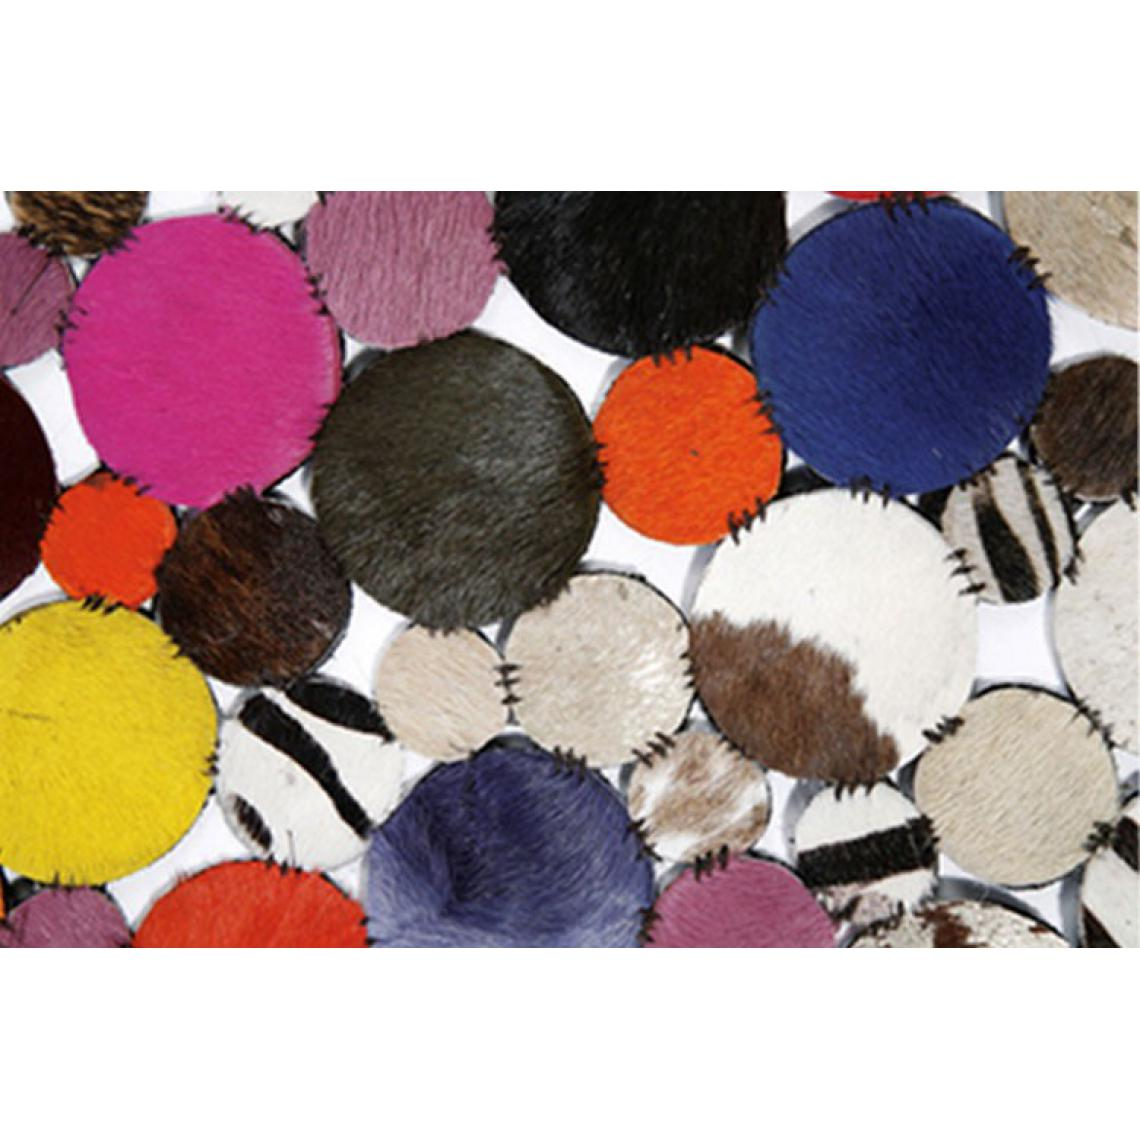 Tapis Rond en Cuir Multicolore 150X150 IrZVU